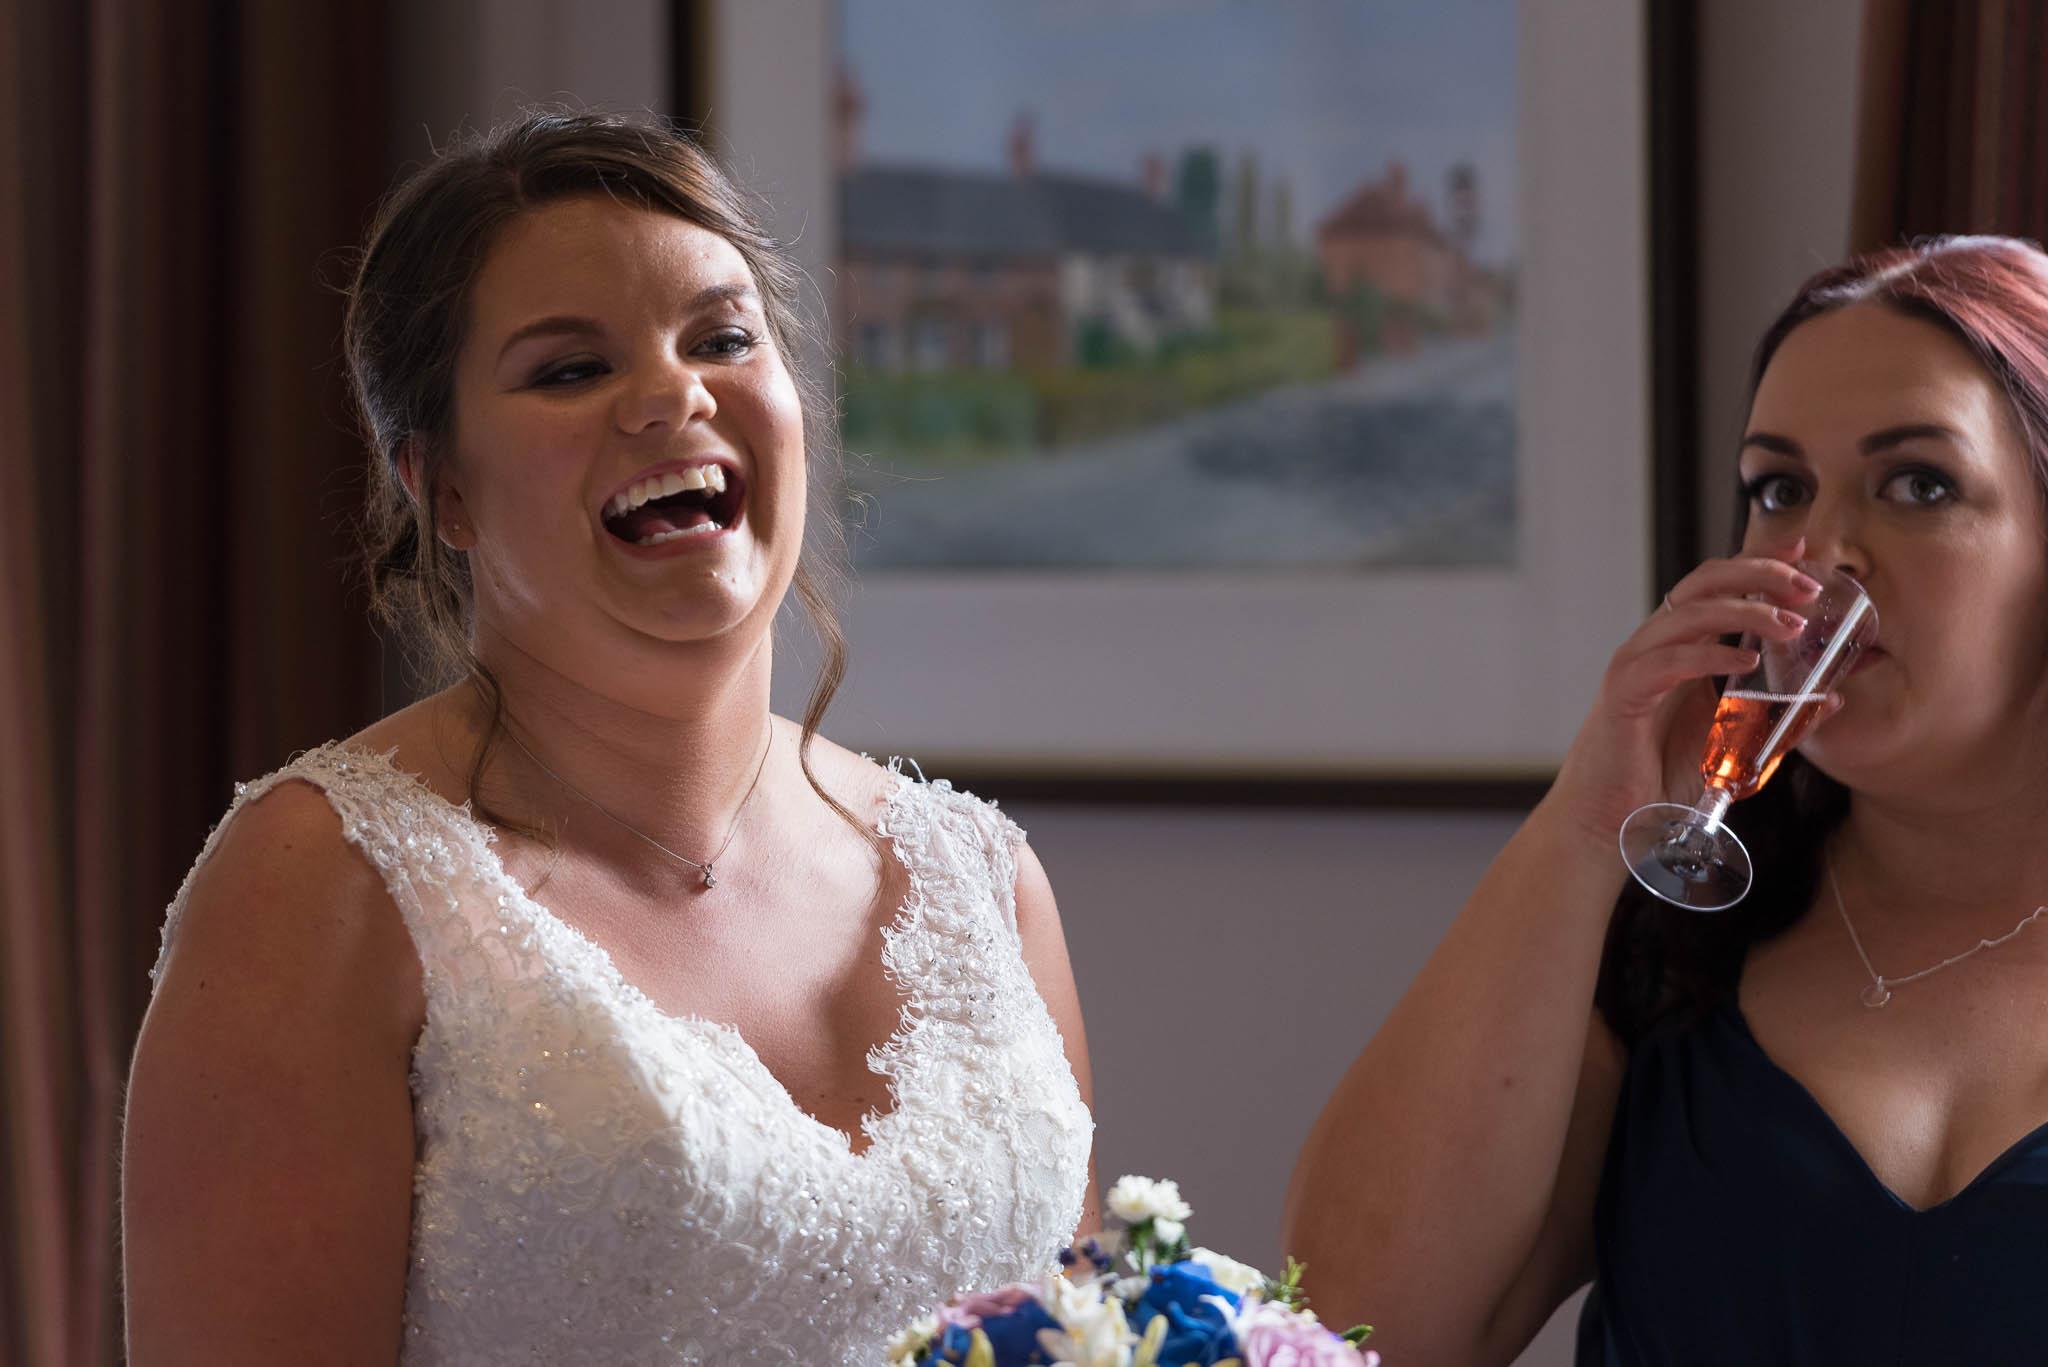 Crathorne Hall Hotel Wedding Photographer46.jpg